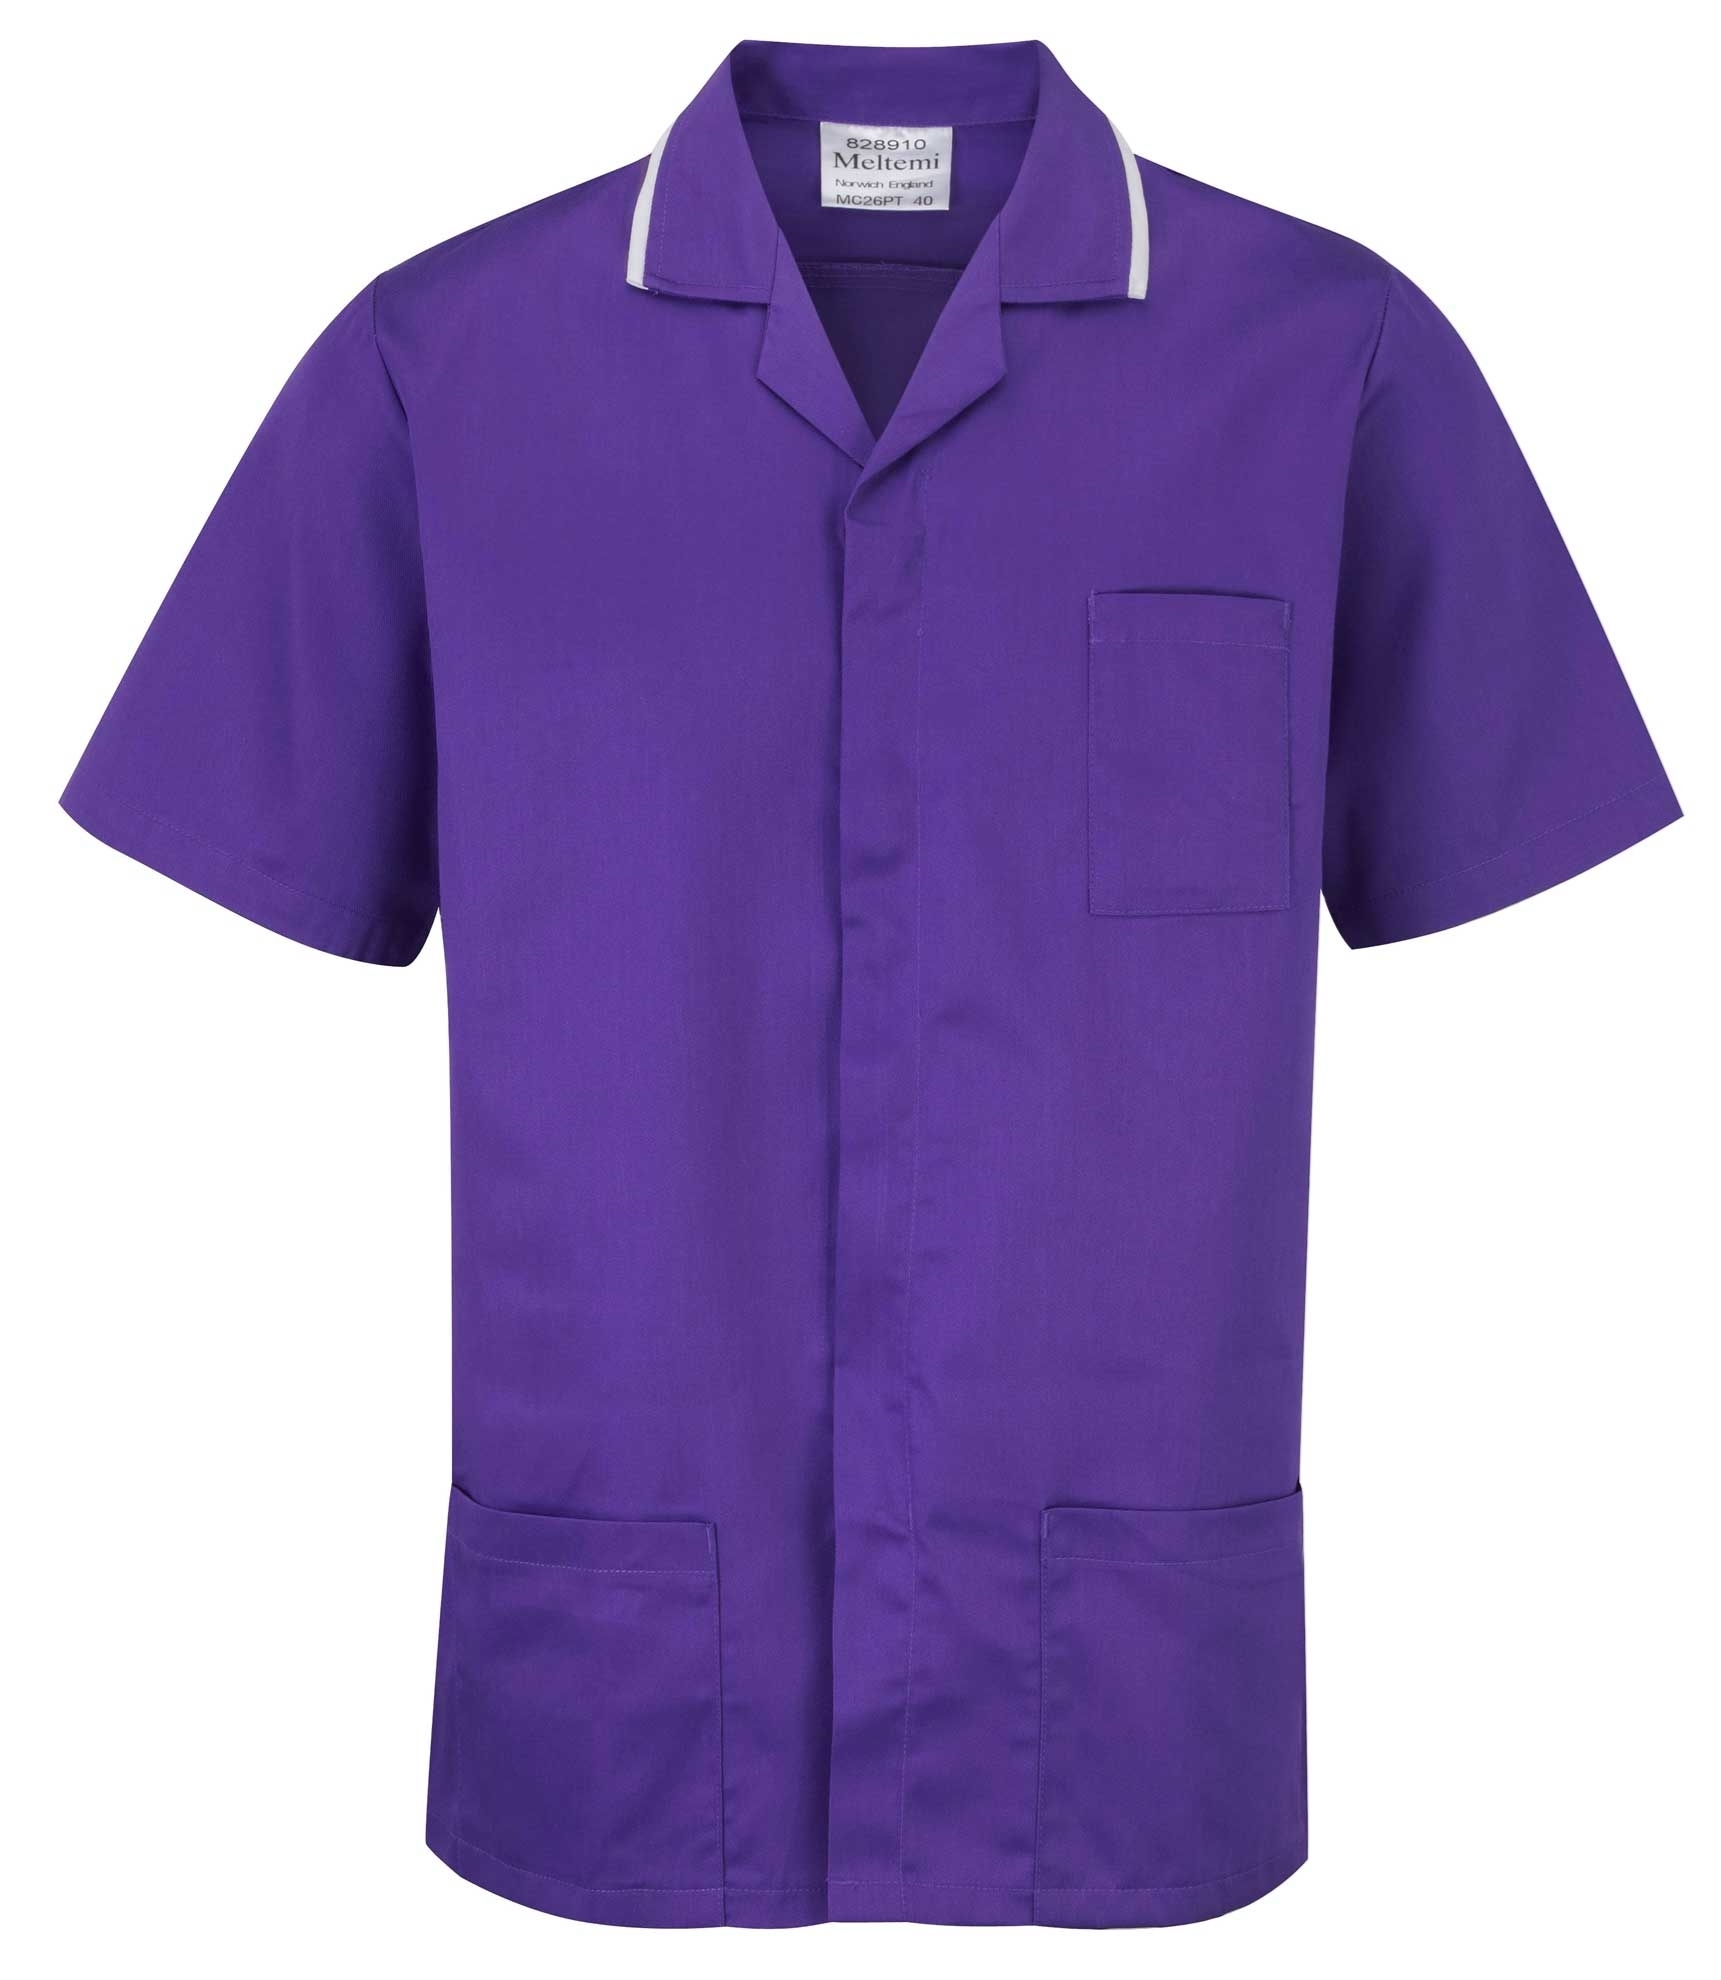 Picture of Advantage Front Fastening Tunic - Purple/White